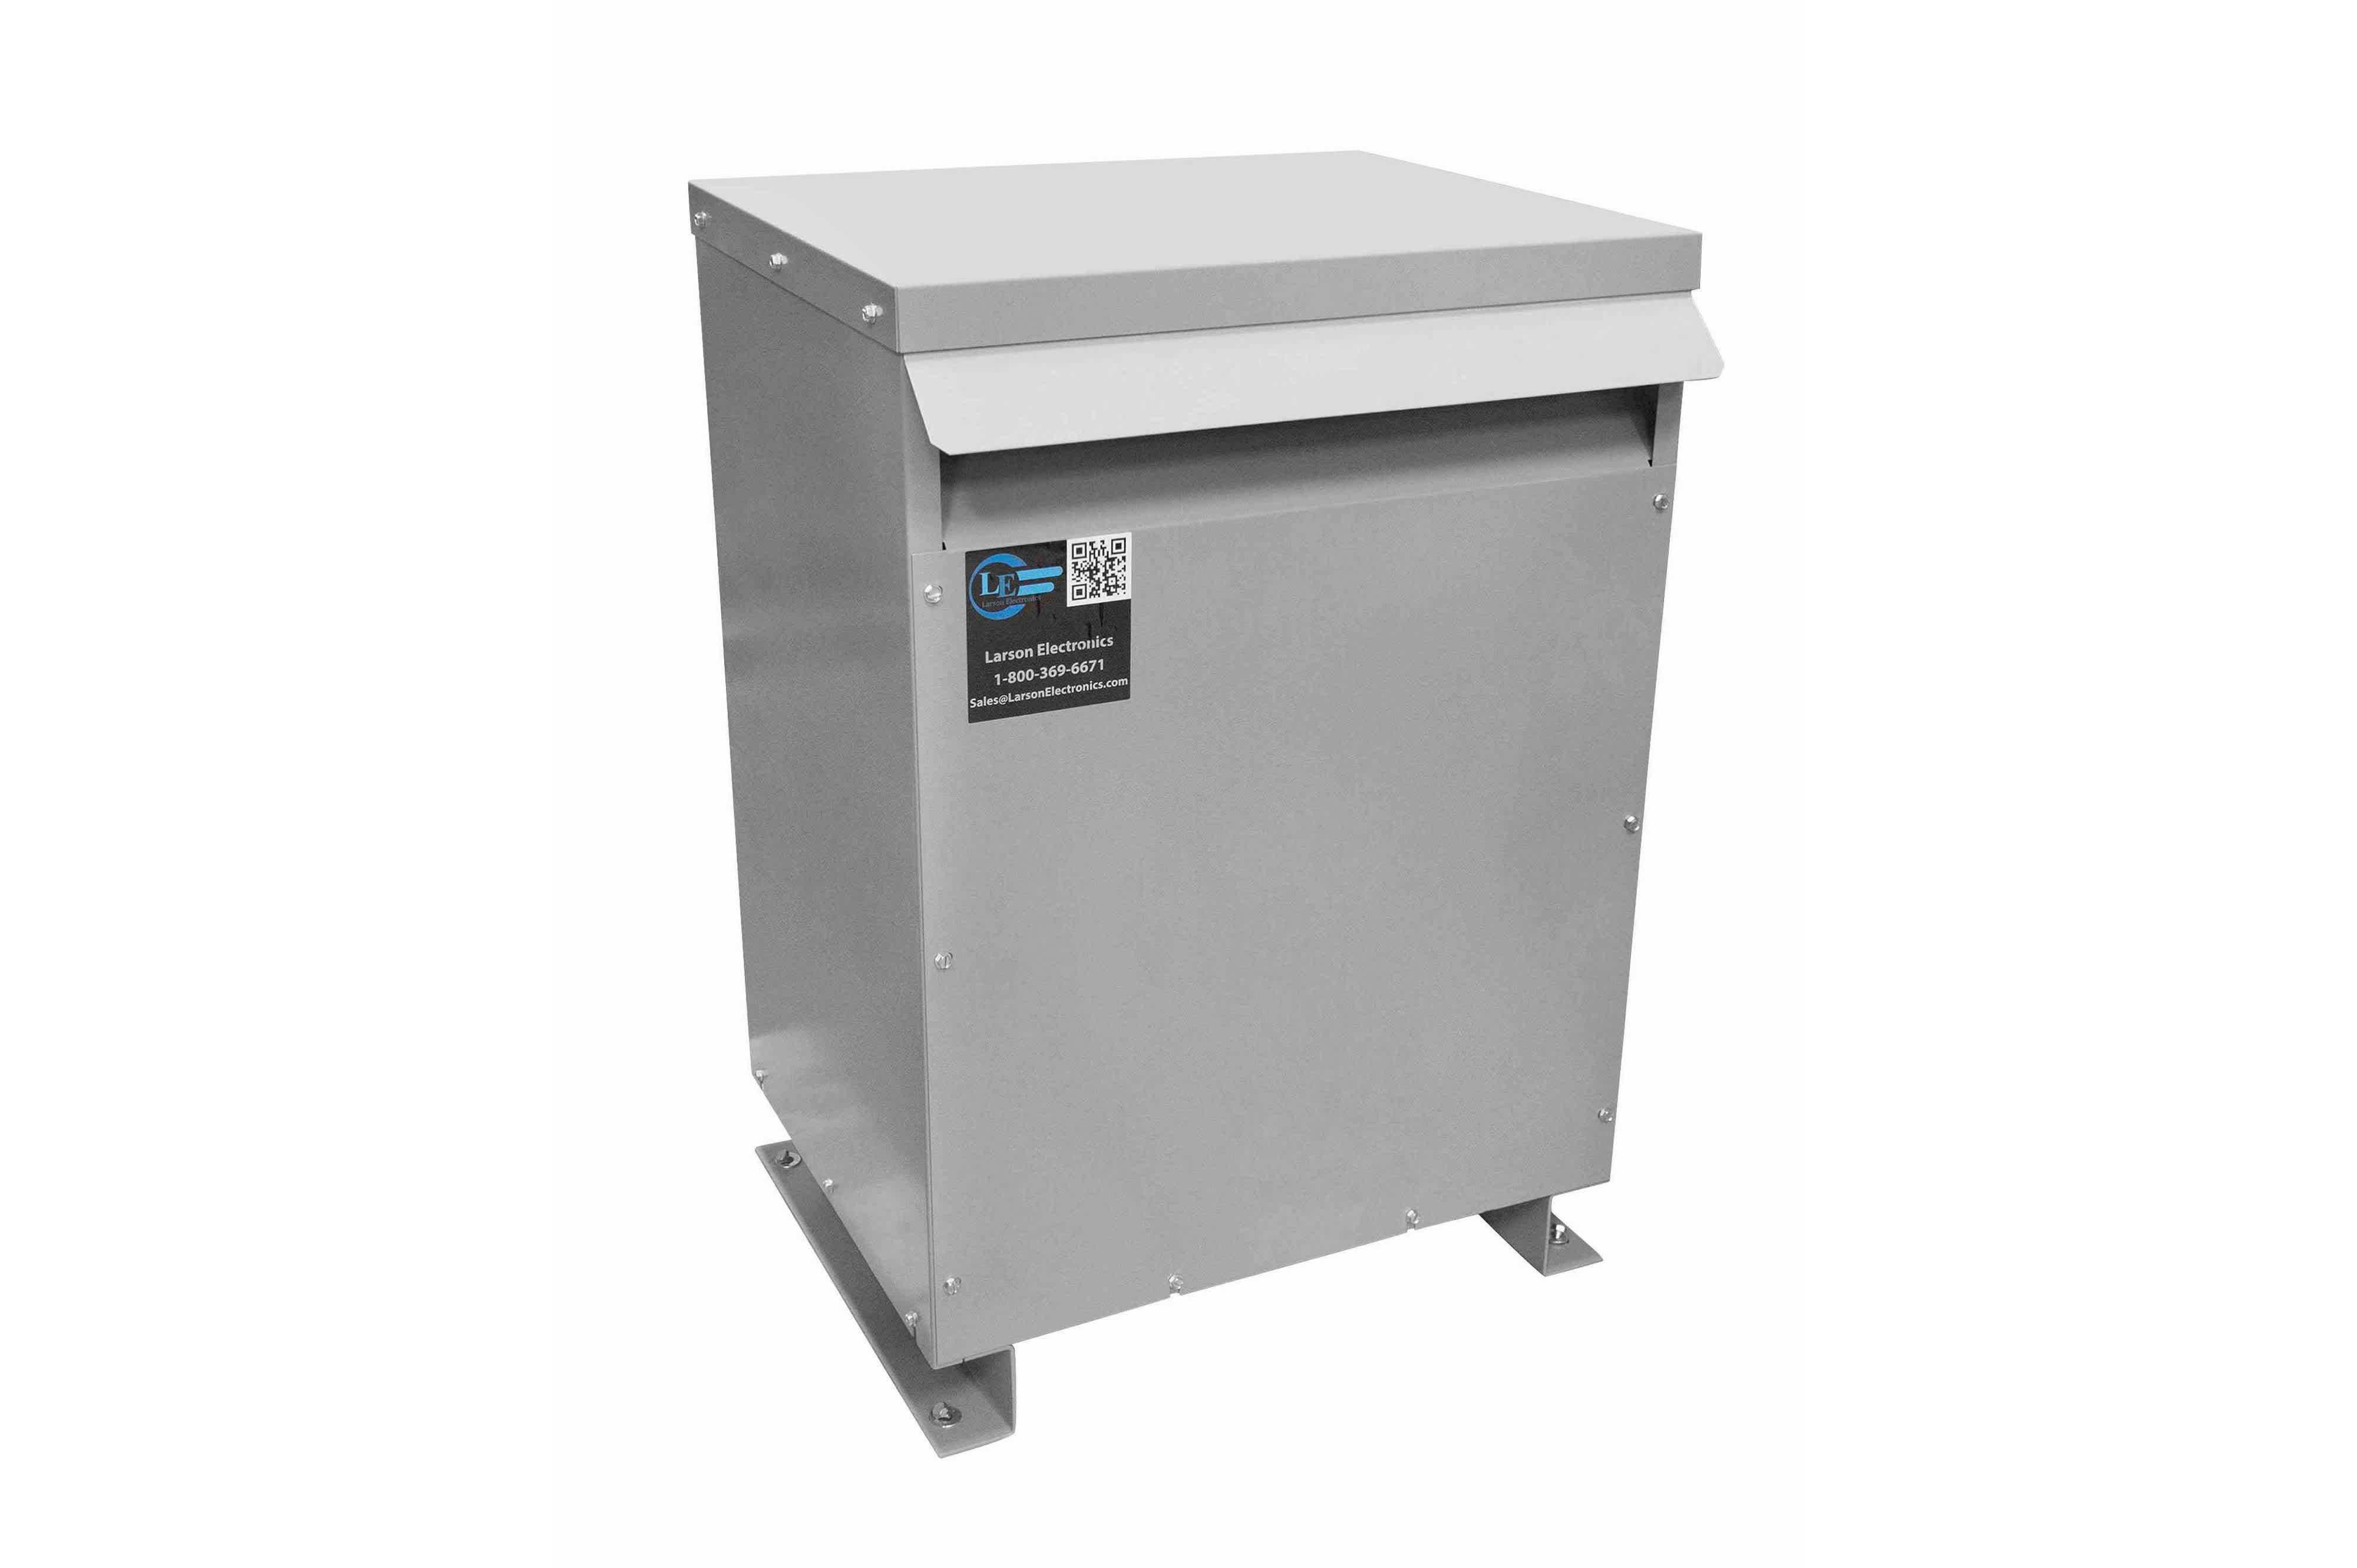 32.5 kVA 3PH Isolation Transformer, 480V Wye Primary, 208V Delta Secondary, N3R, Ventilated, 60 Hz